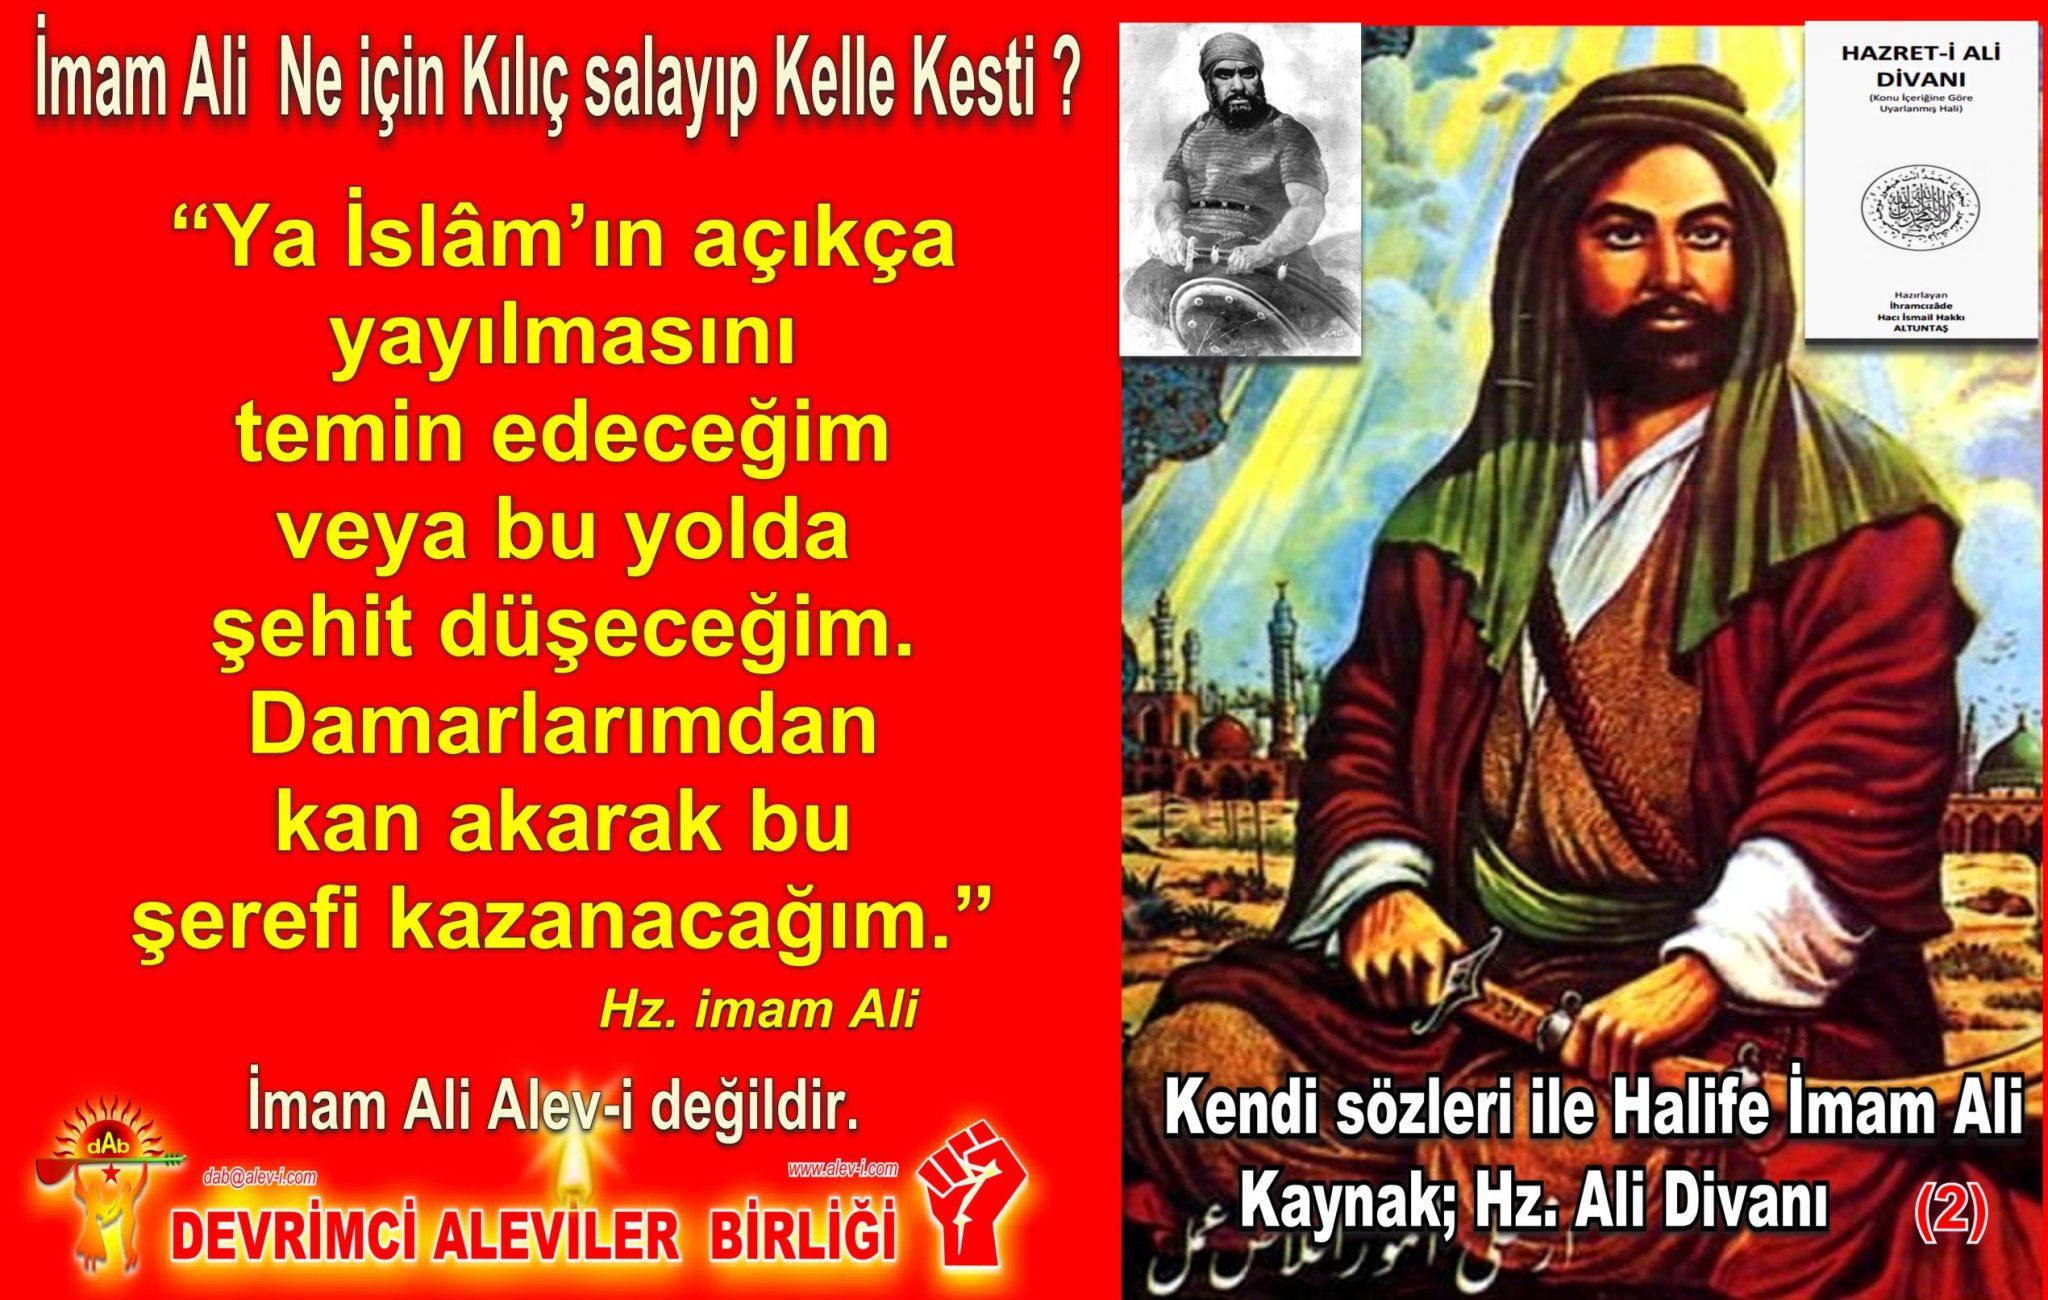 2 Hz imam Ali divani Alevi bektasi kizilbas pir sultan devrimci aleviler birligi DAB Feramuz Sah Acar